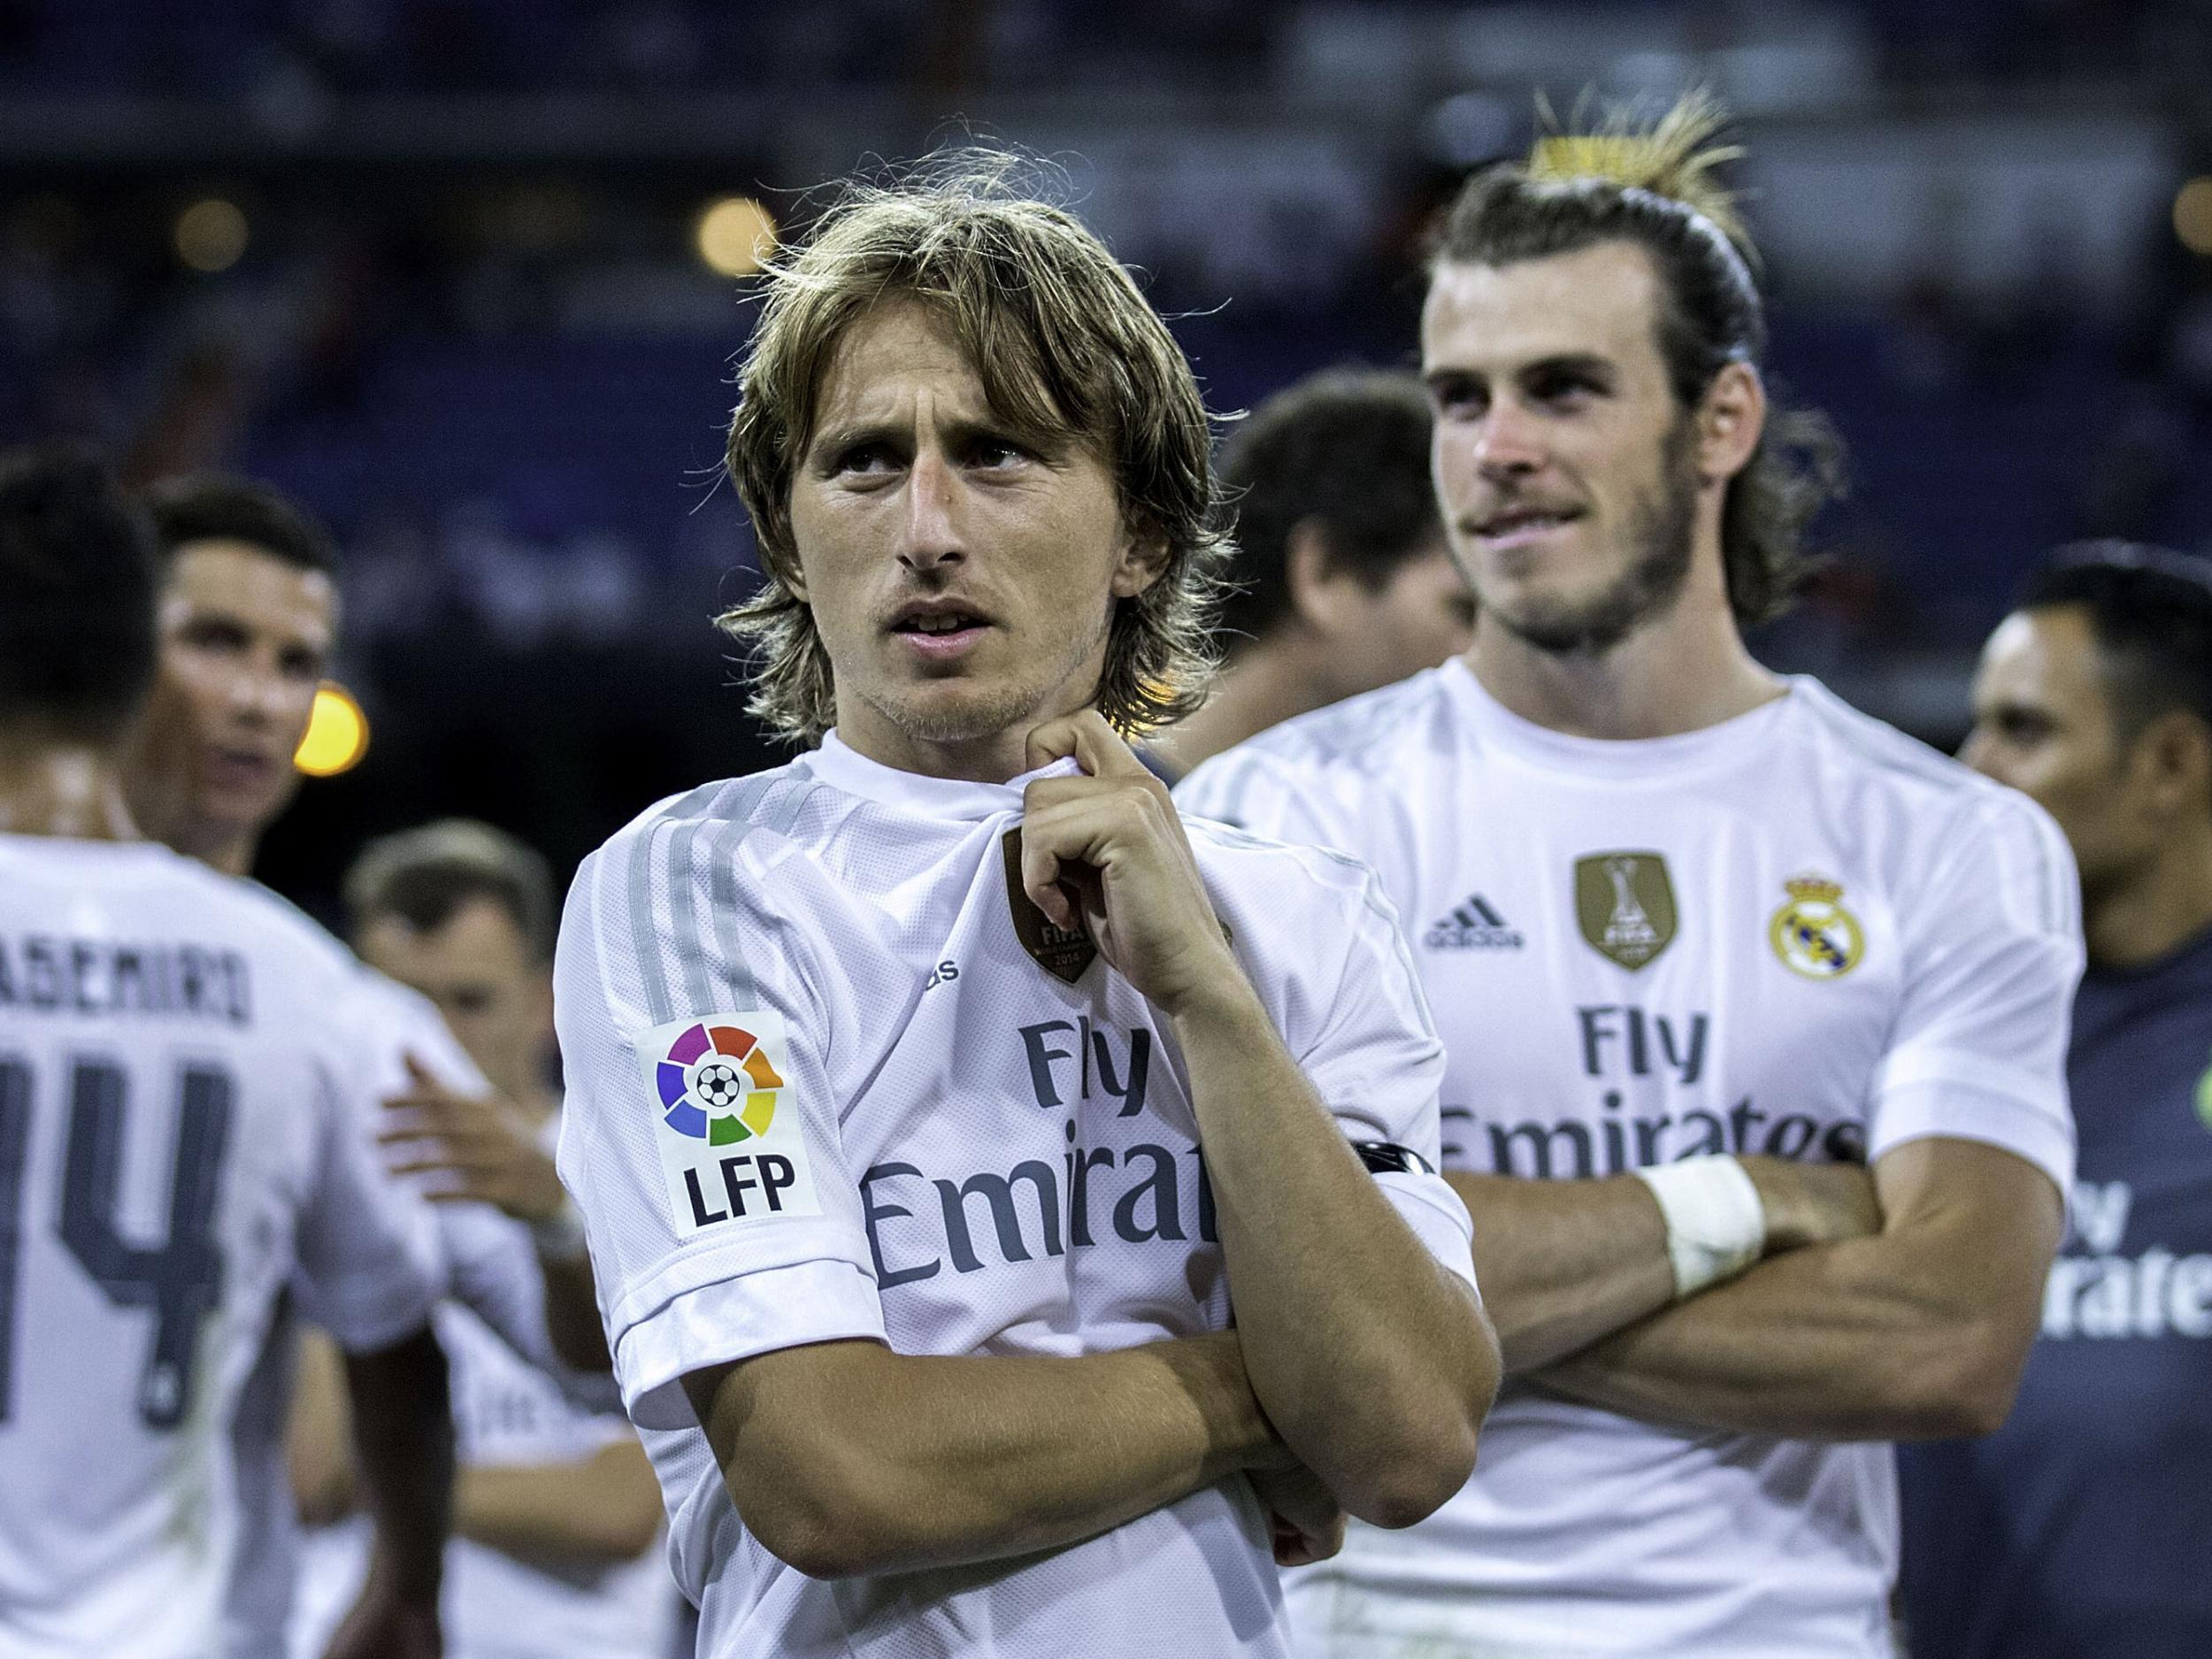 La Liga 2016/17: Gareth Bale names Luka Modric as the most hard-working  player in training